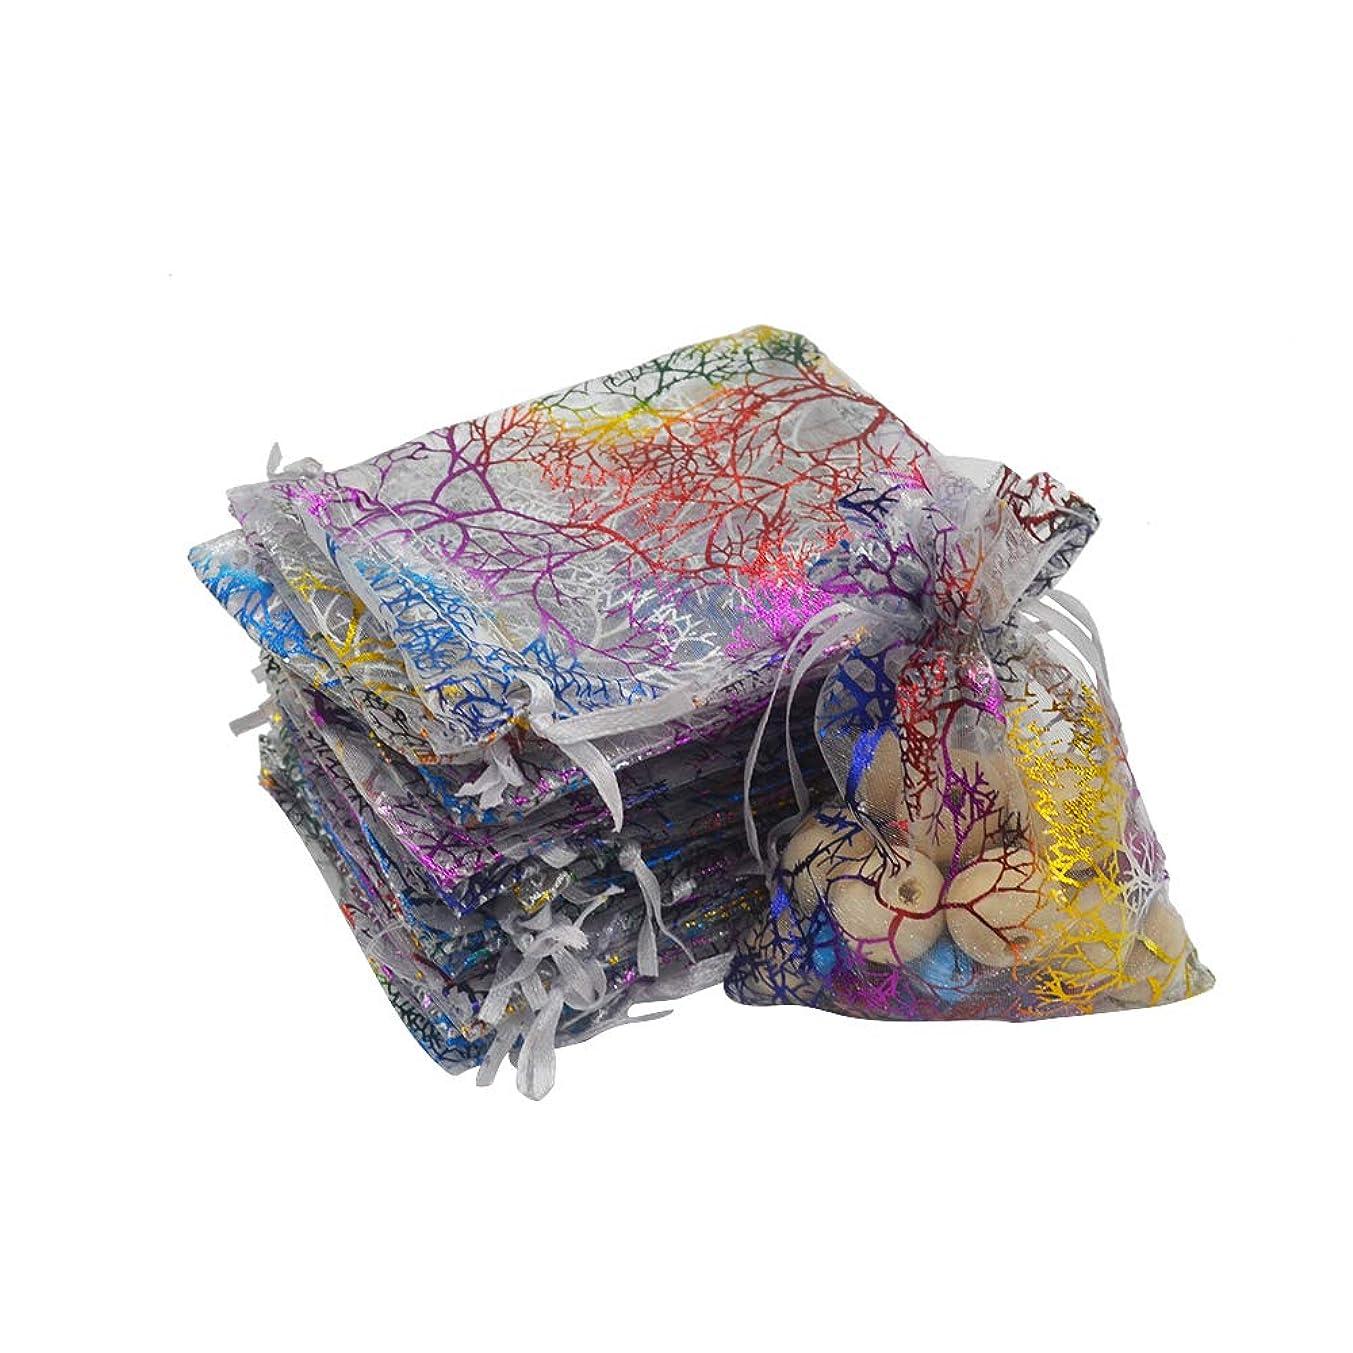 Lautechco Organza Bags 5